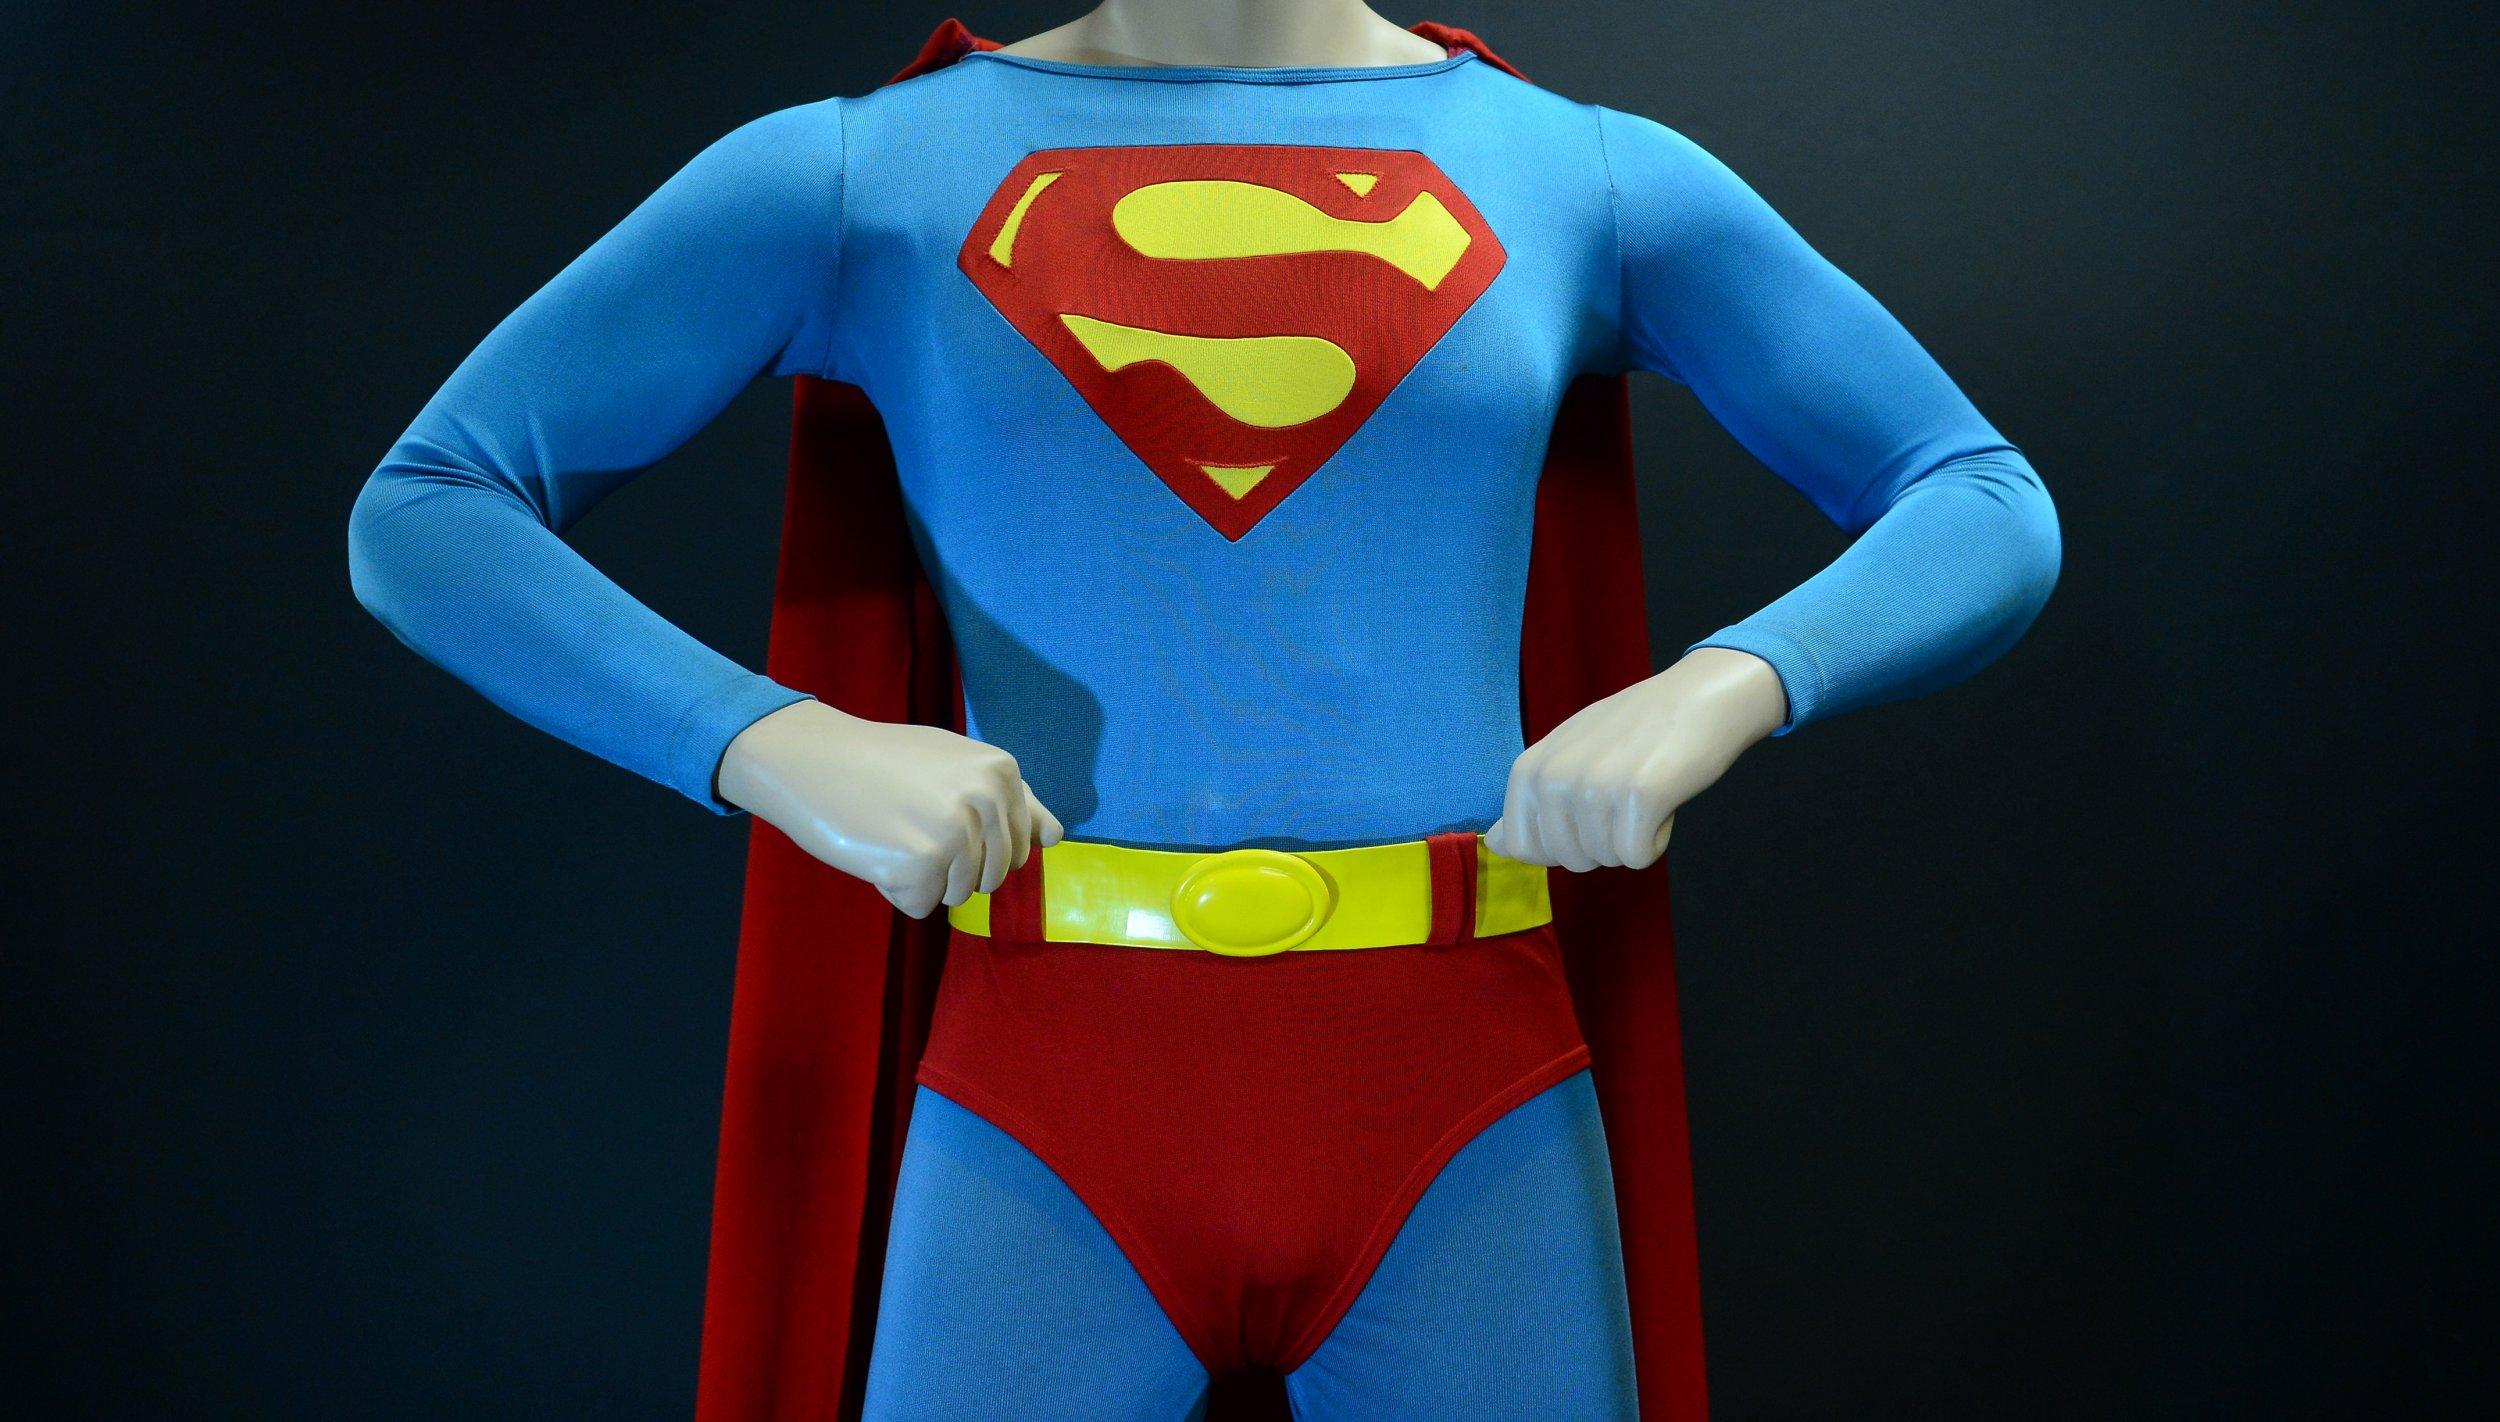 09_13_superman_power_pose